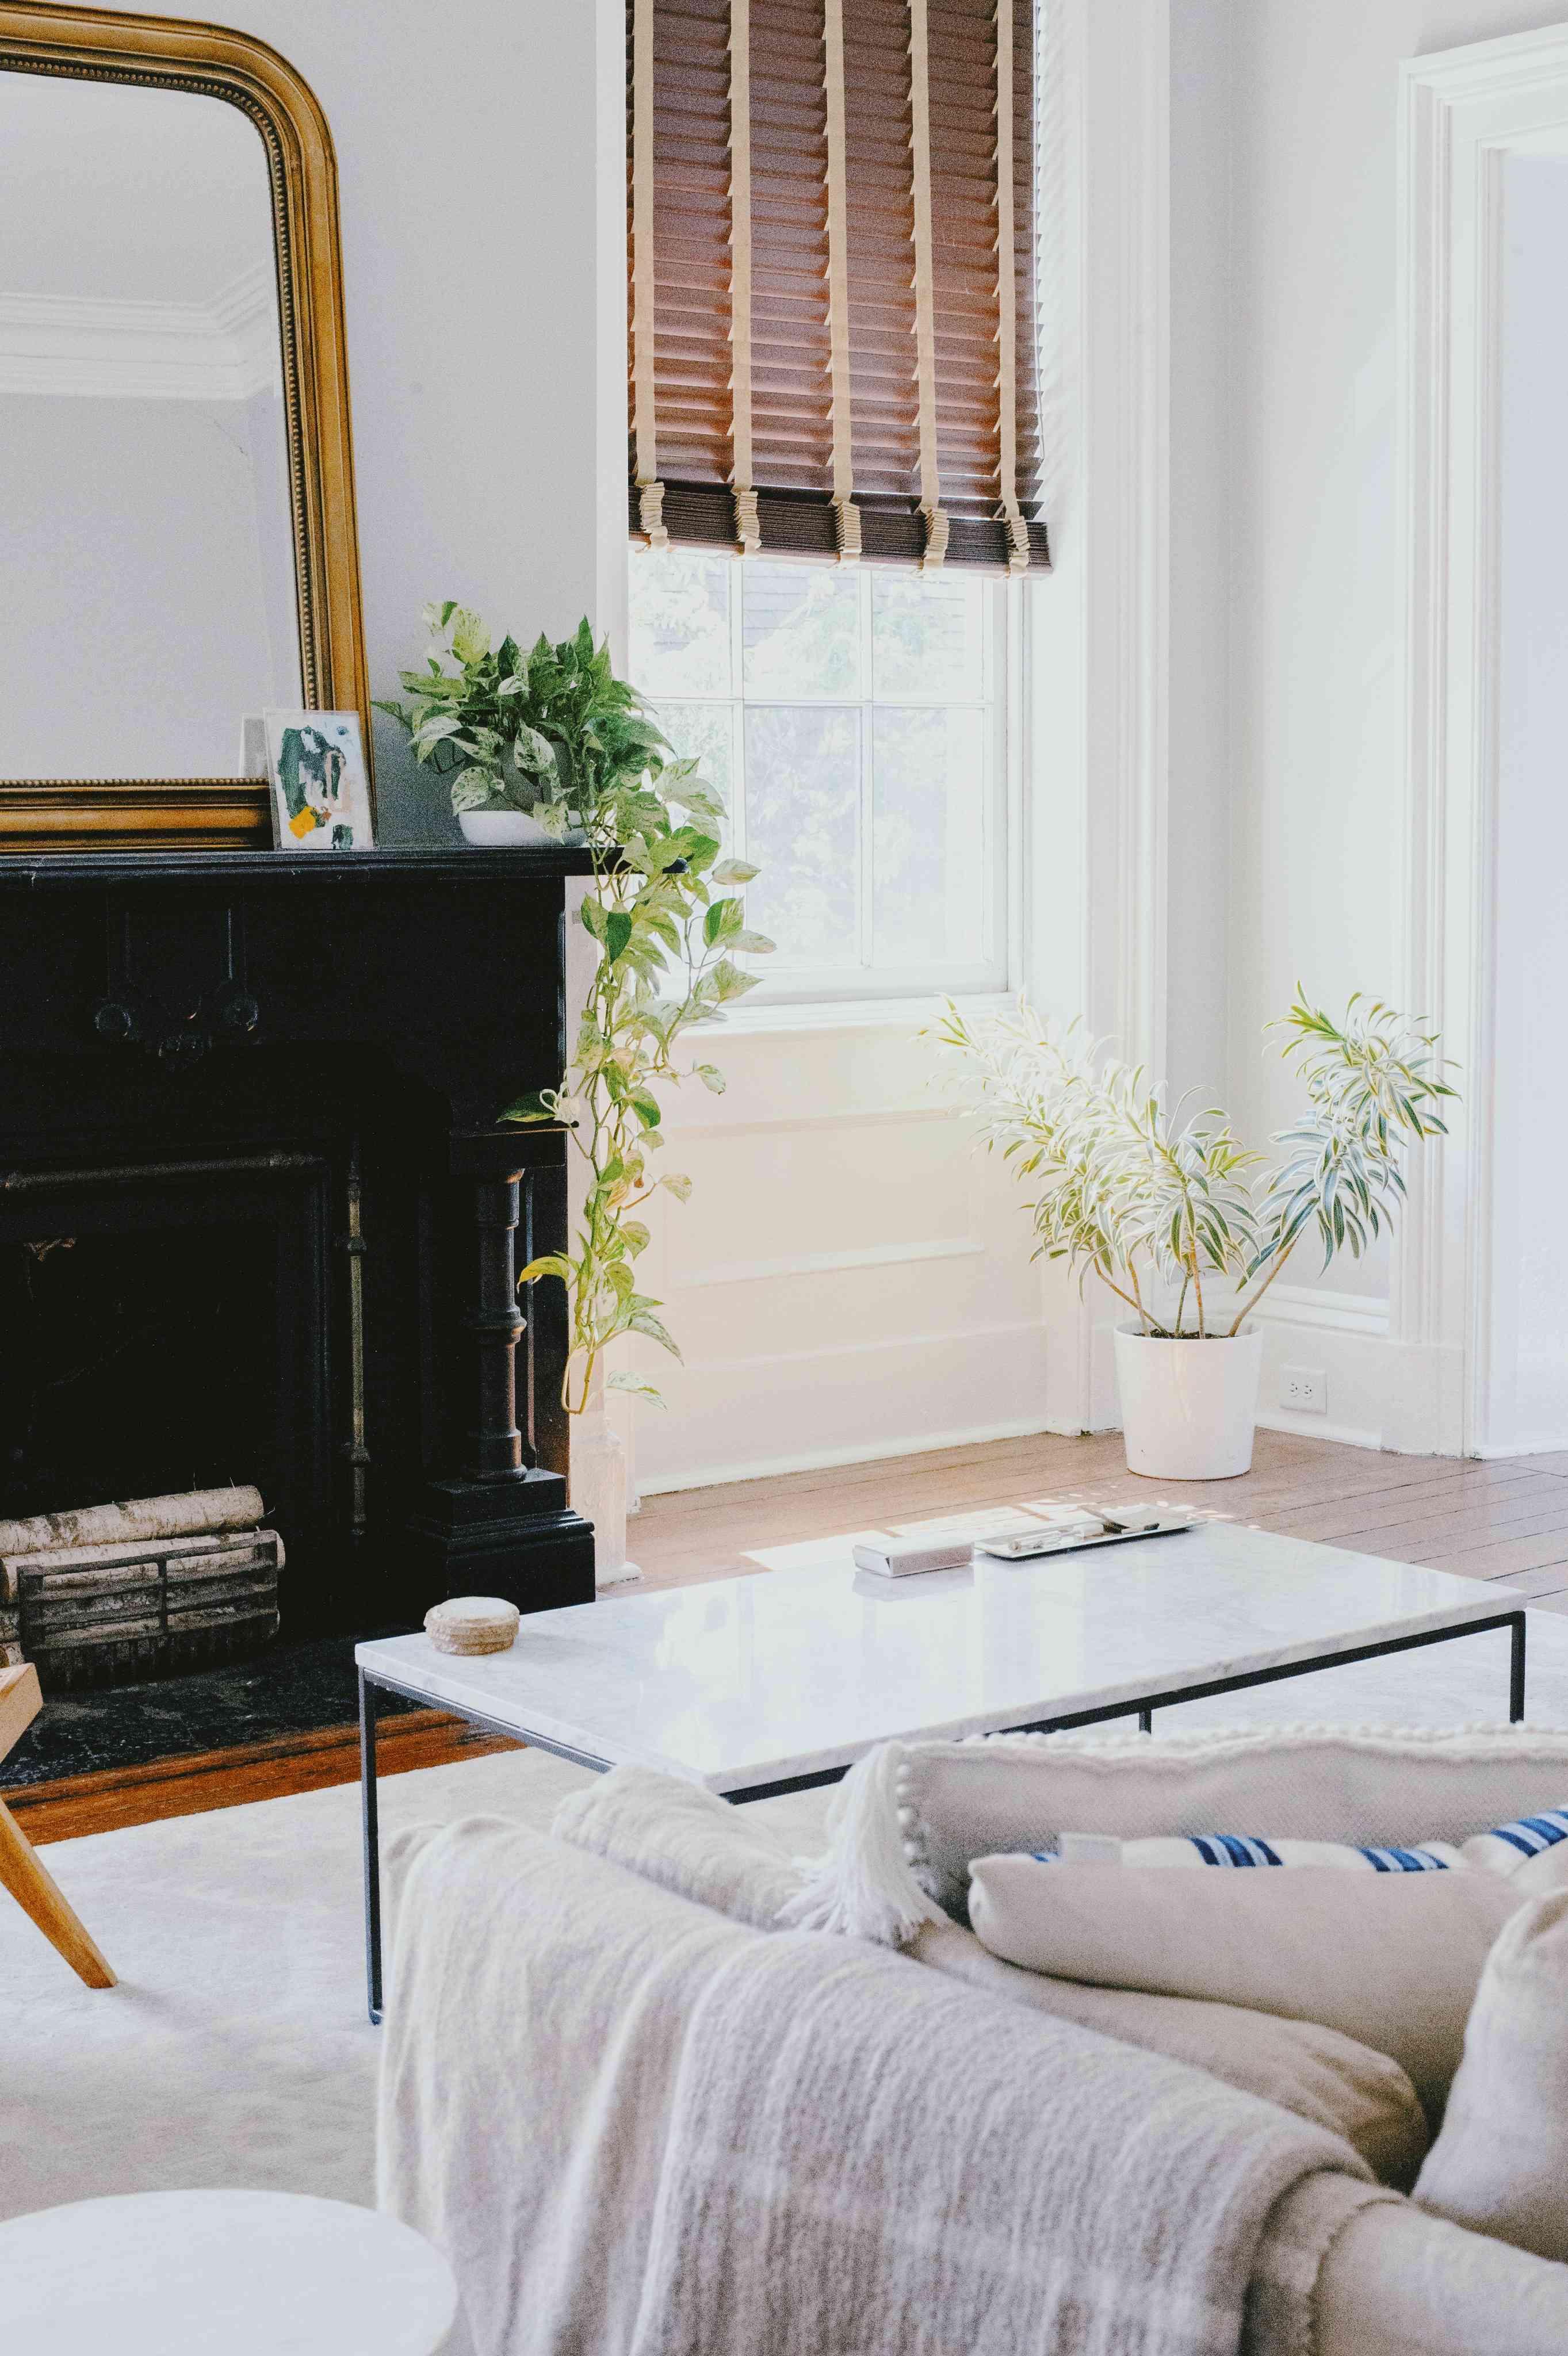 Amanda Greeley home tour - living room with sofa and coffee table